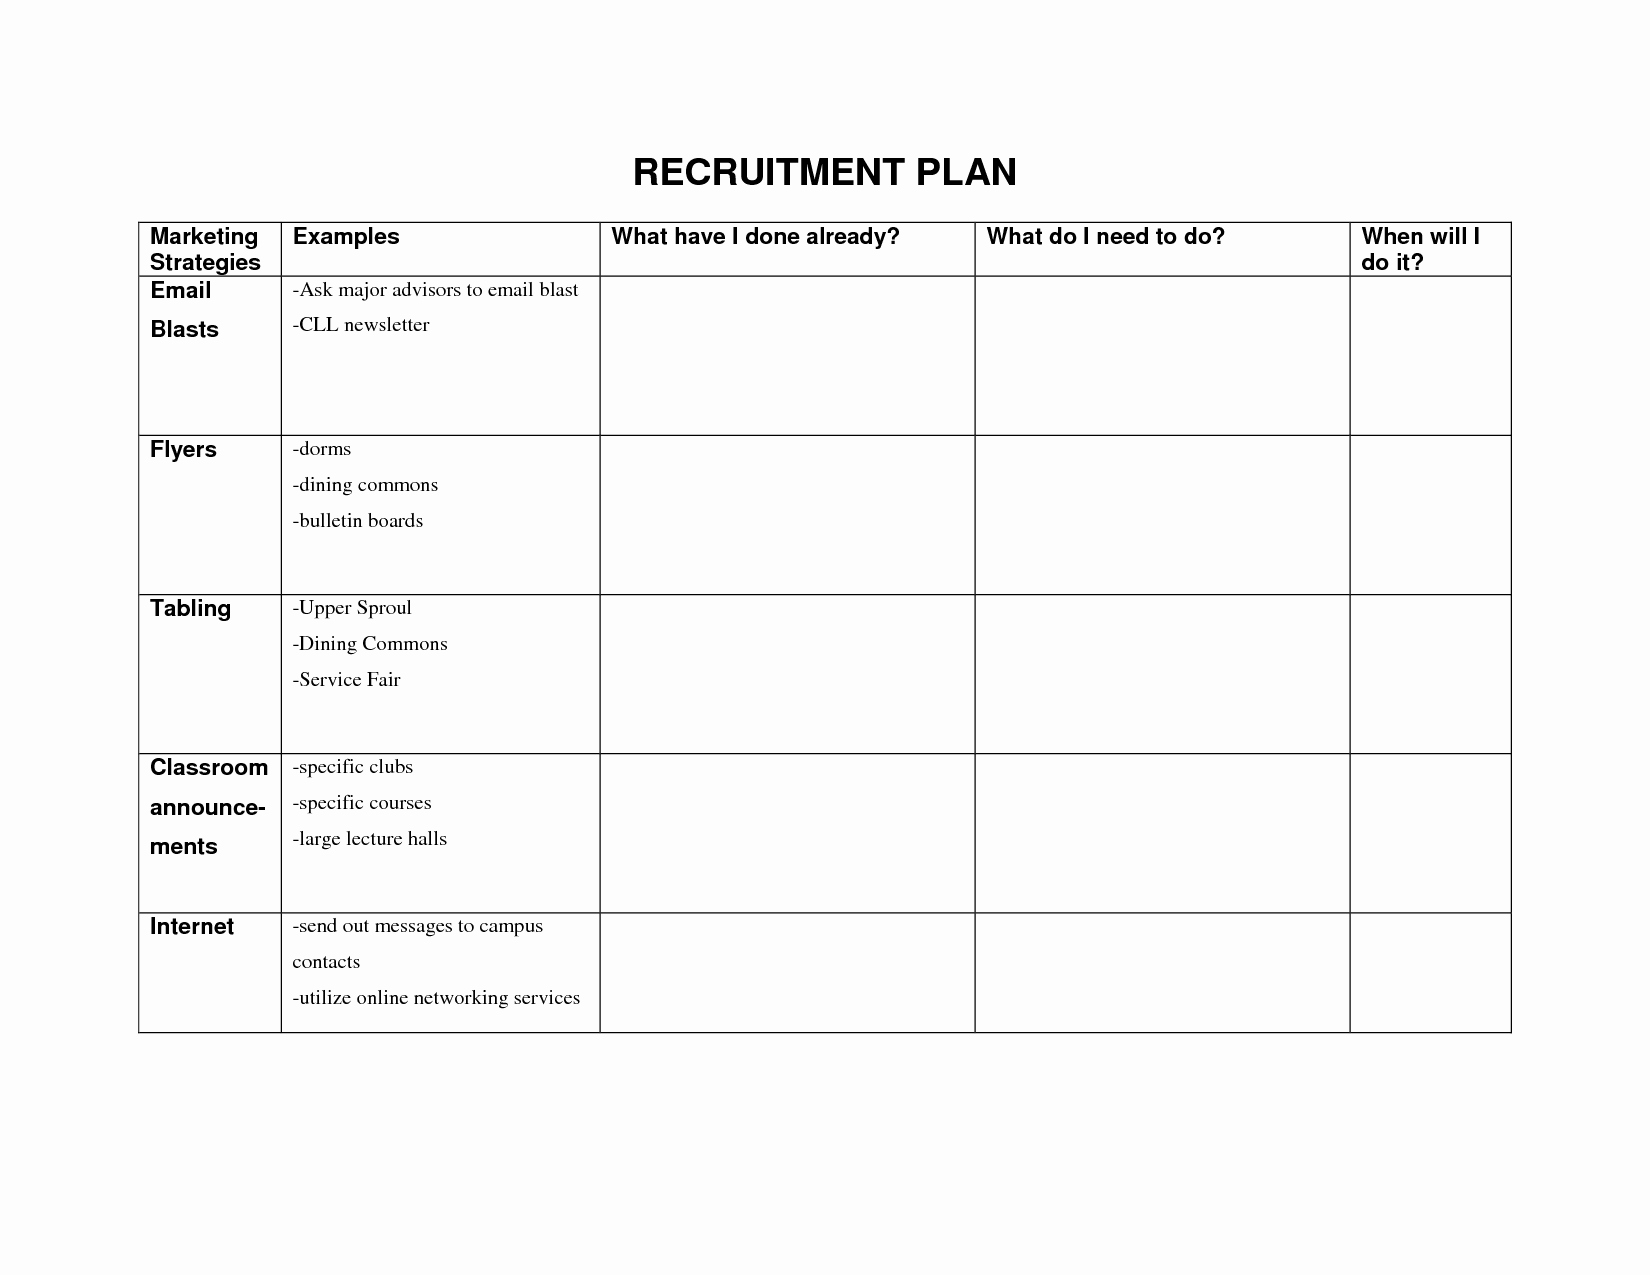 Recruitment Strategic Plan Template Luxury Recruitment forms and Templates Recruiter forms